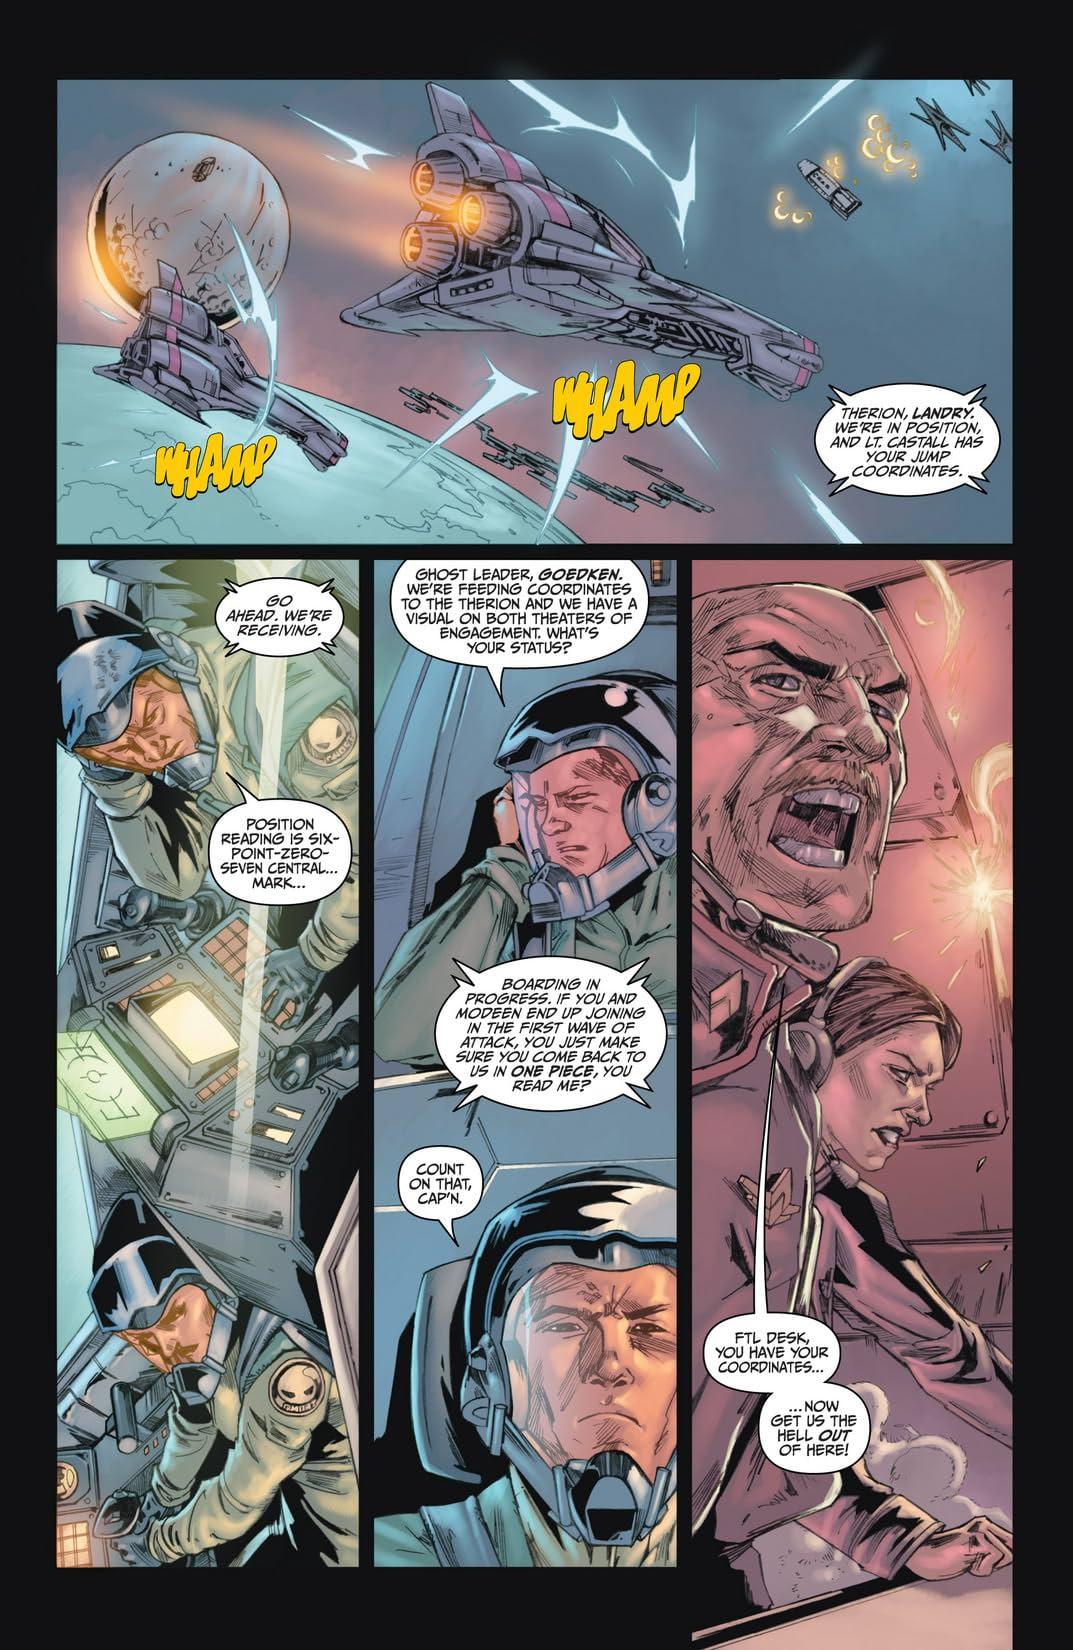 Battlestar Galactica #2 (of 4): Ghosts